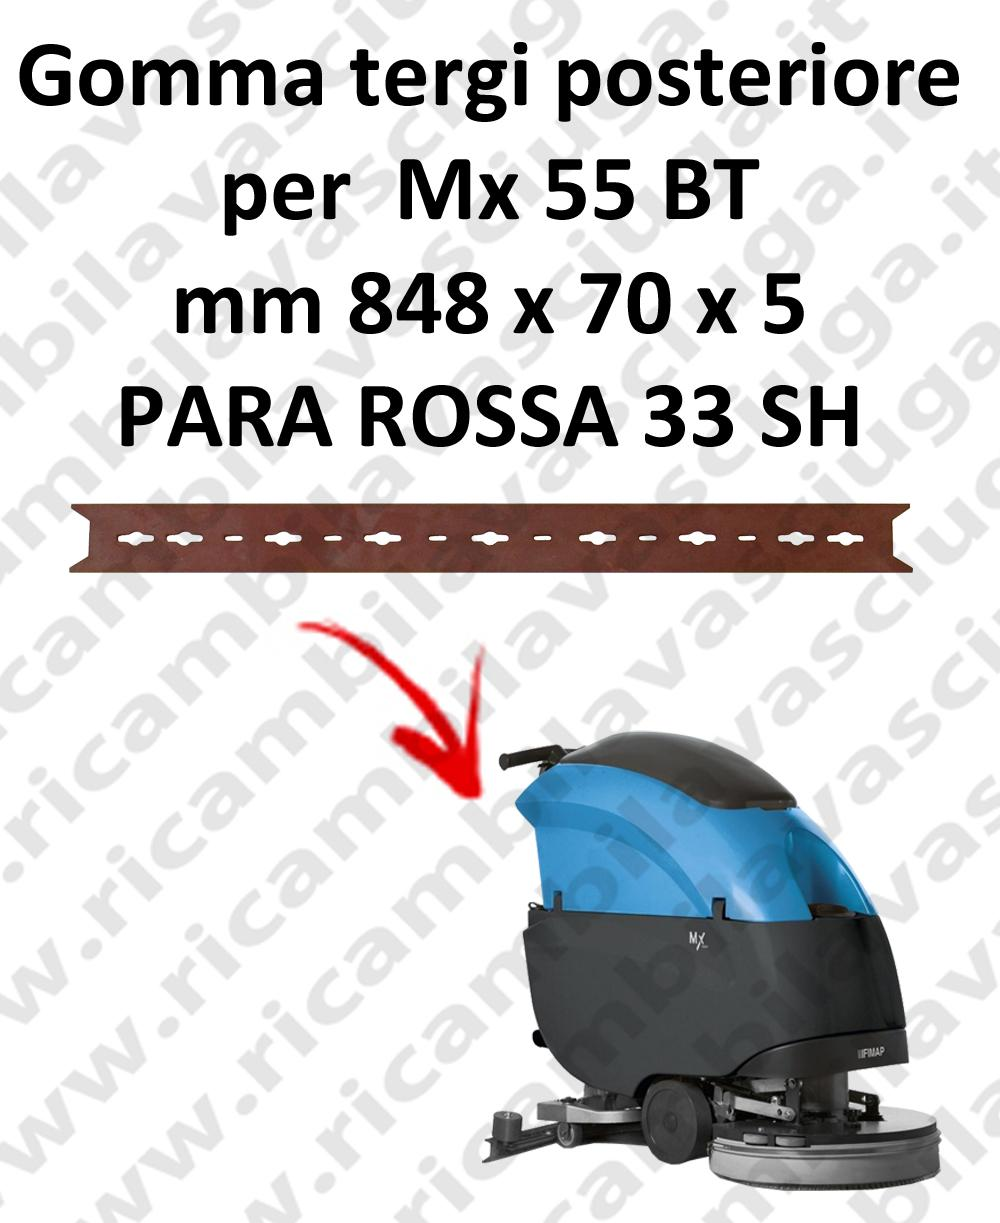 Gomma tergipavimento posteriore per lavapavimenti FIMAP Mx 55 BT